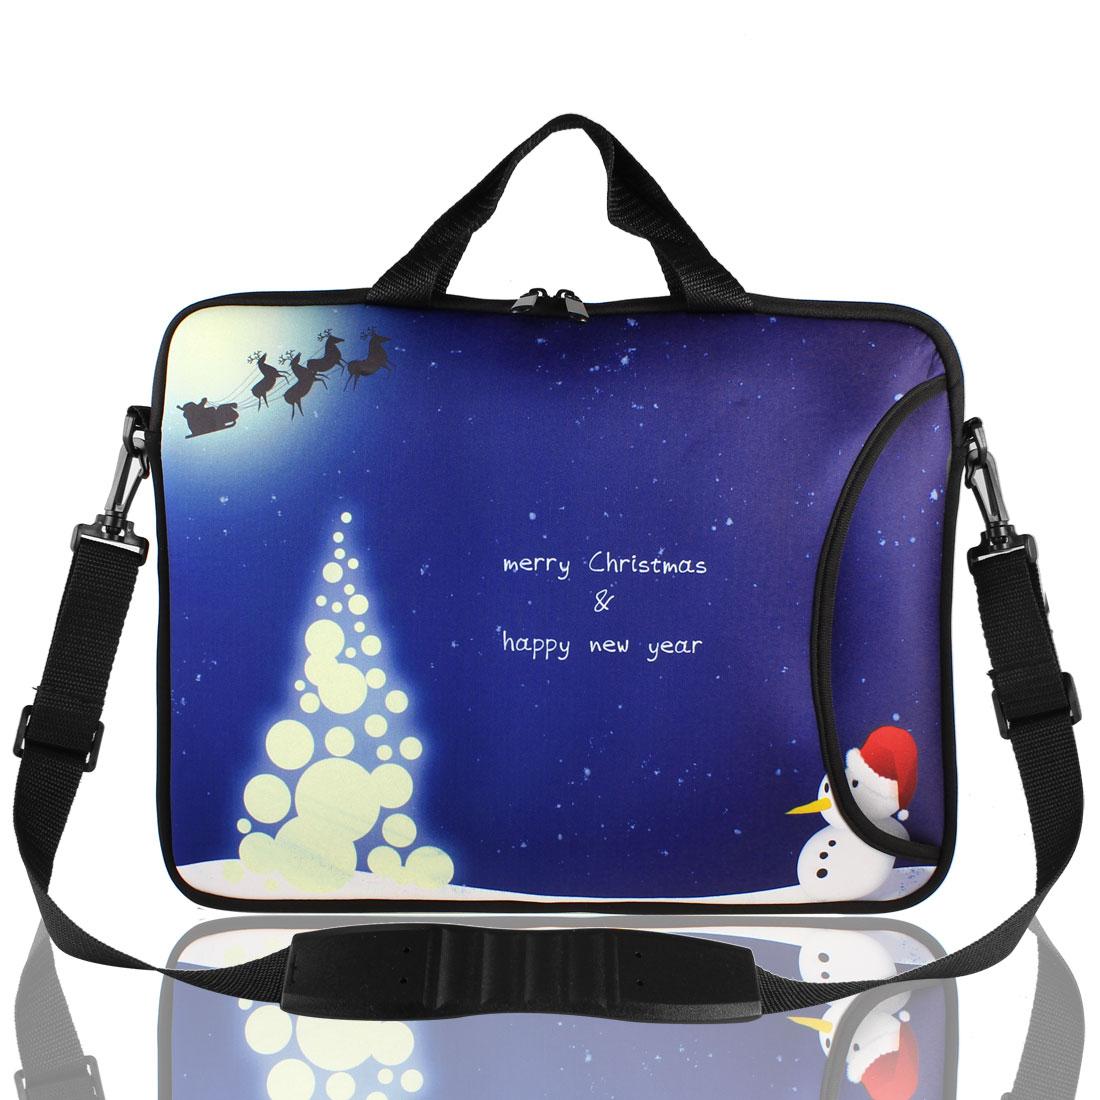 "15"" 15.4"" 15.6"" Snowman Print Notebook Laptop Handle Shoulder Sleeve Bag Pouch Cover"